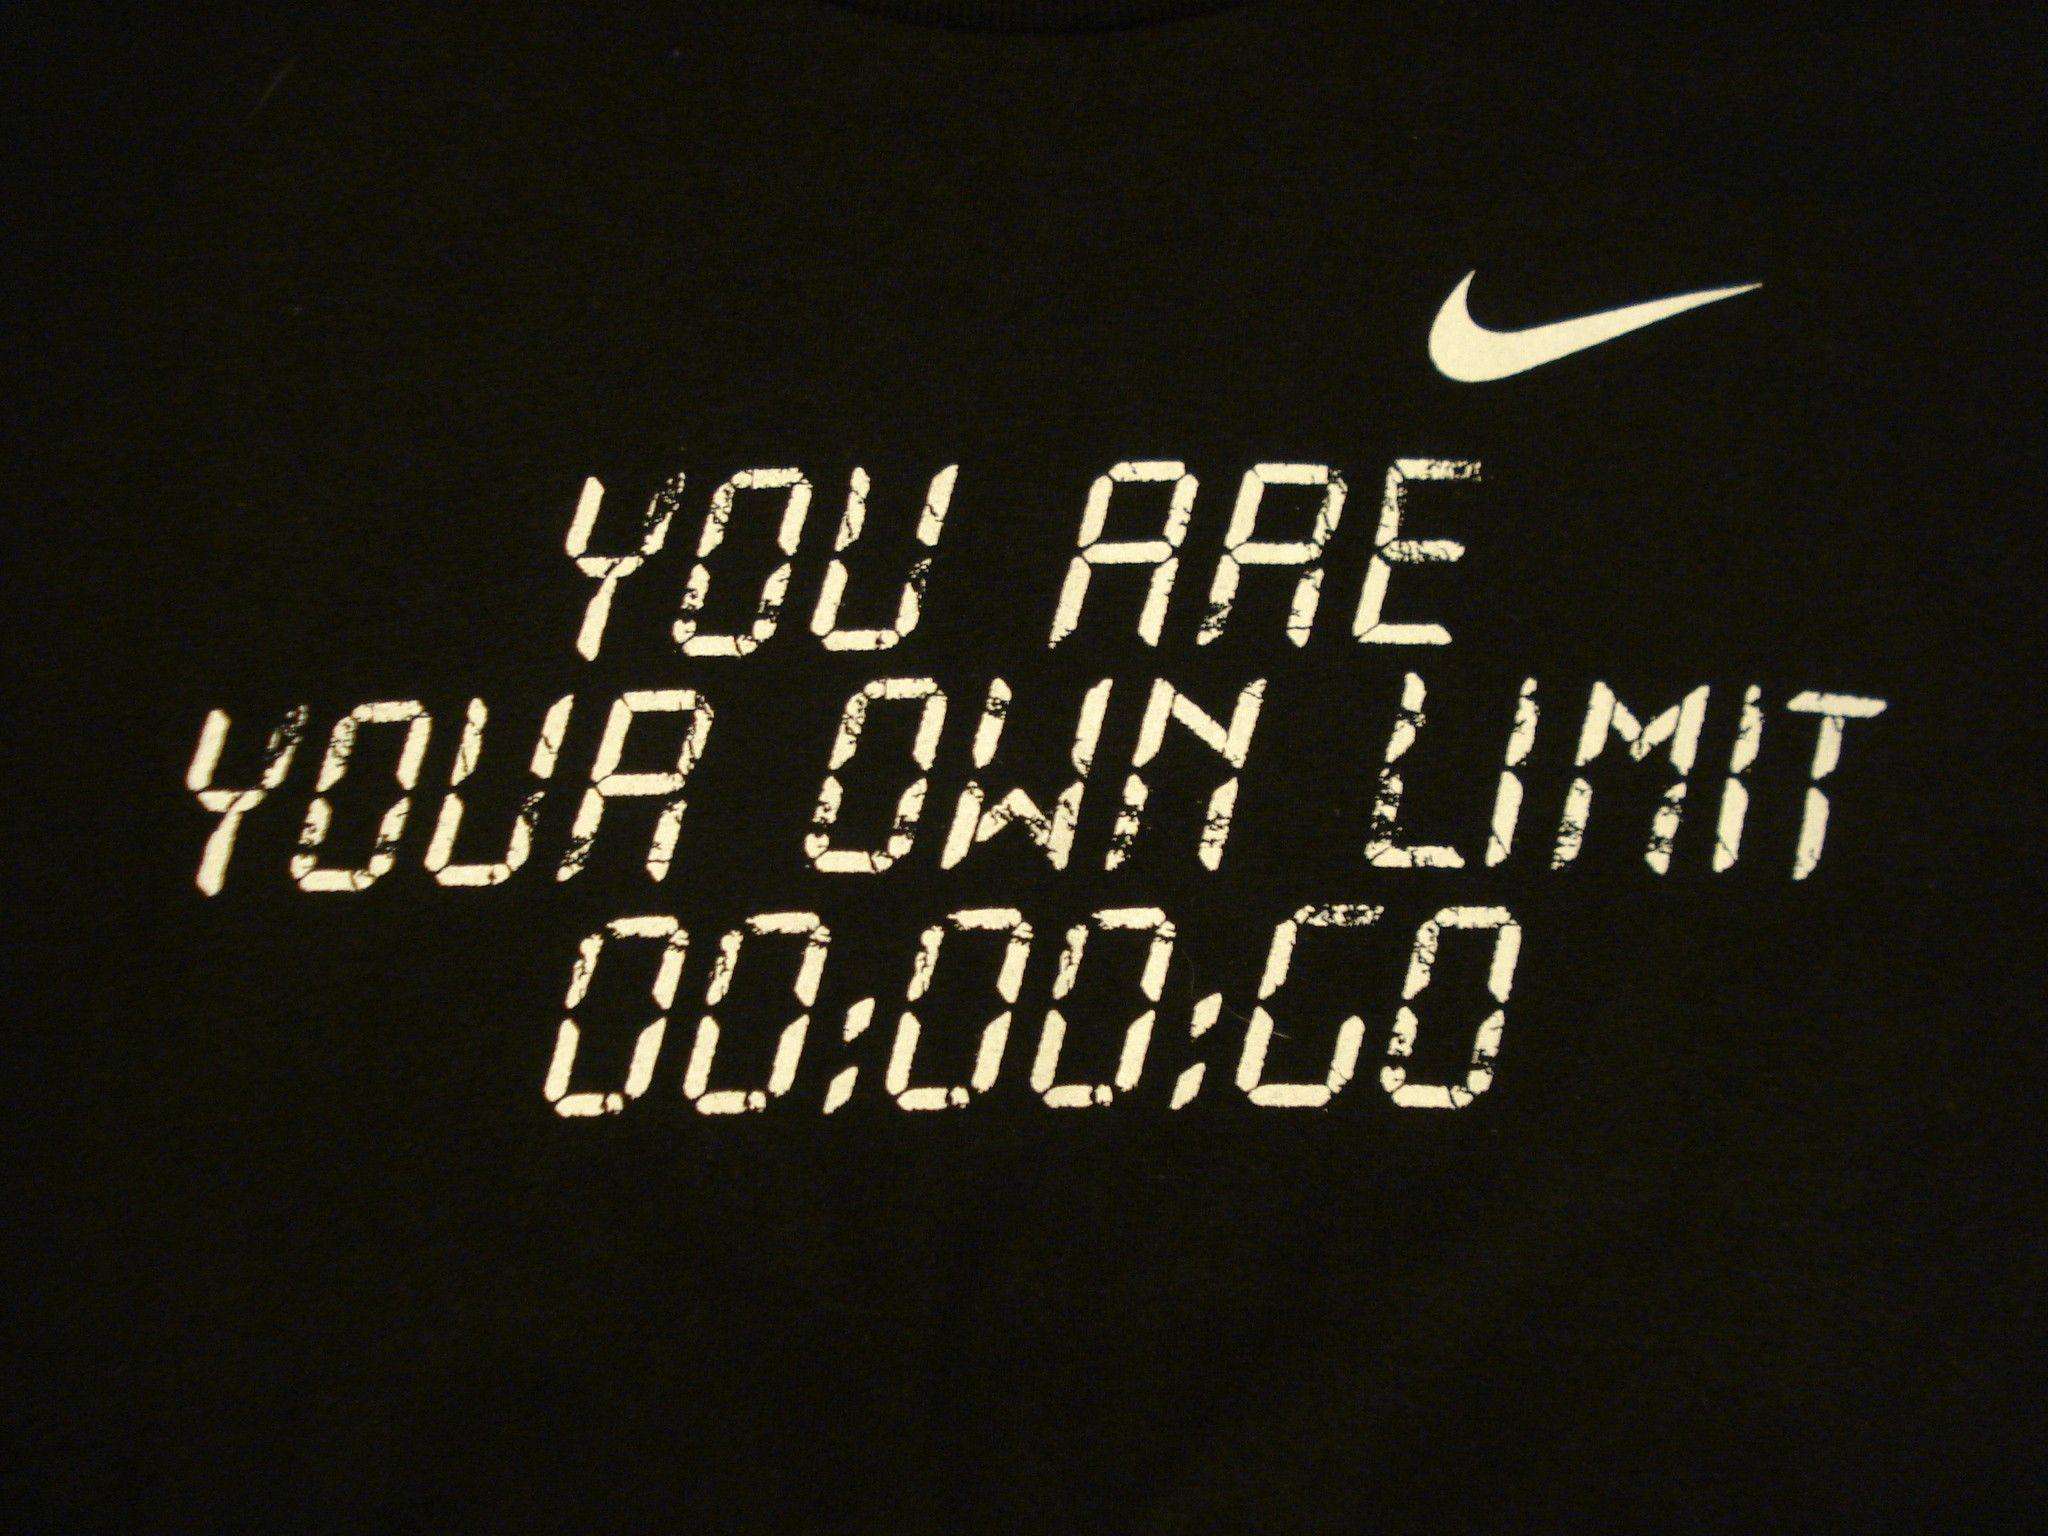 Nike Motivational Wallpapers